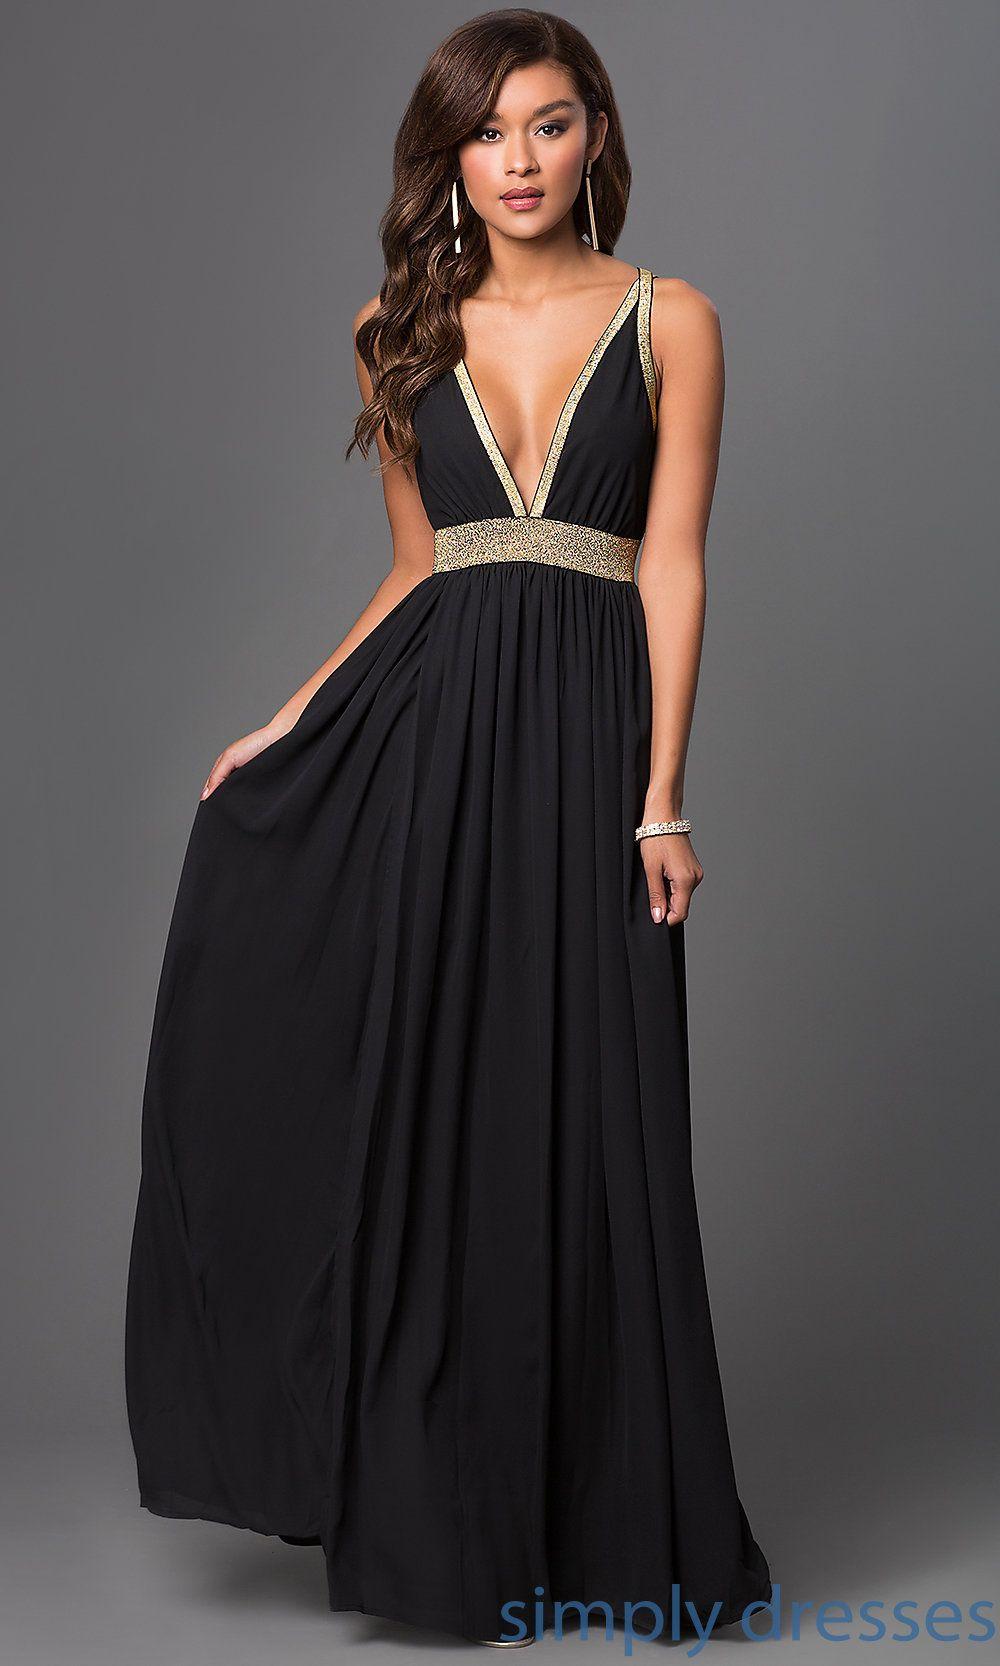 Long low vneck backless dress otros pinterest prom dresses